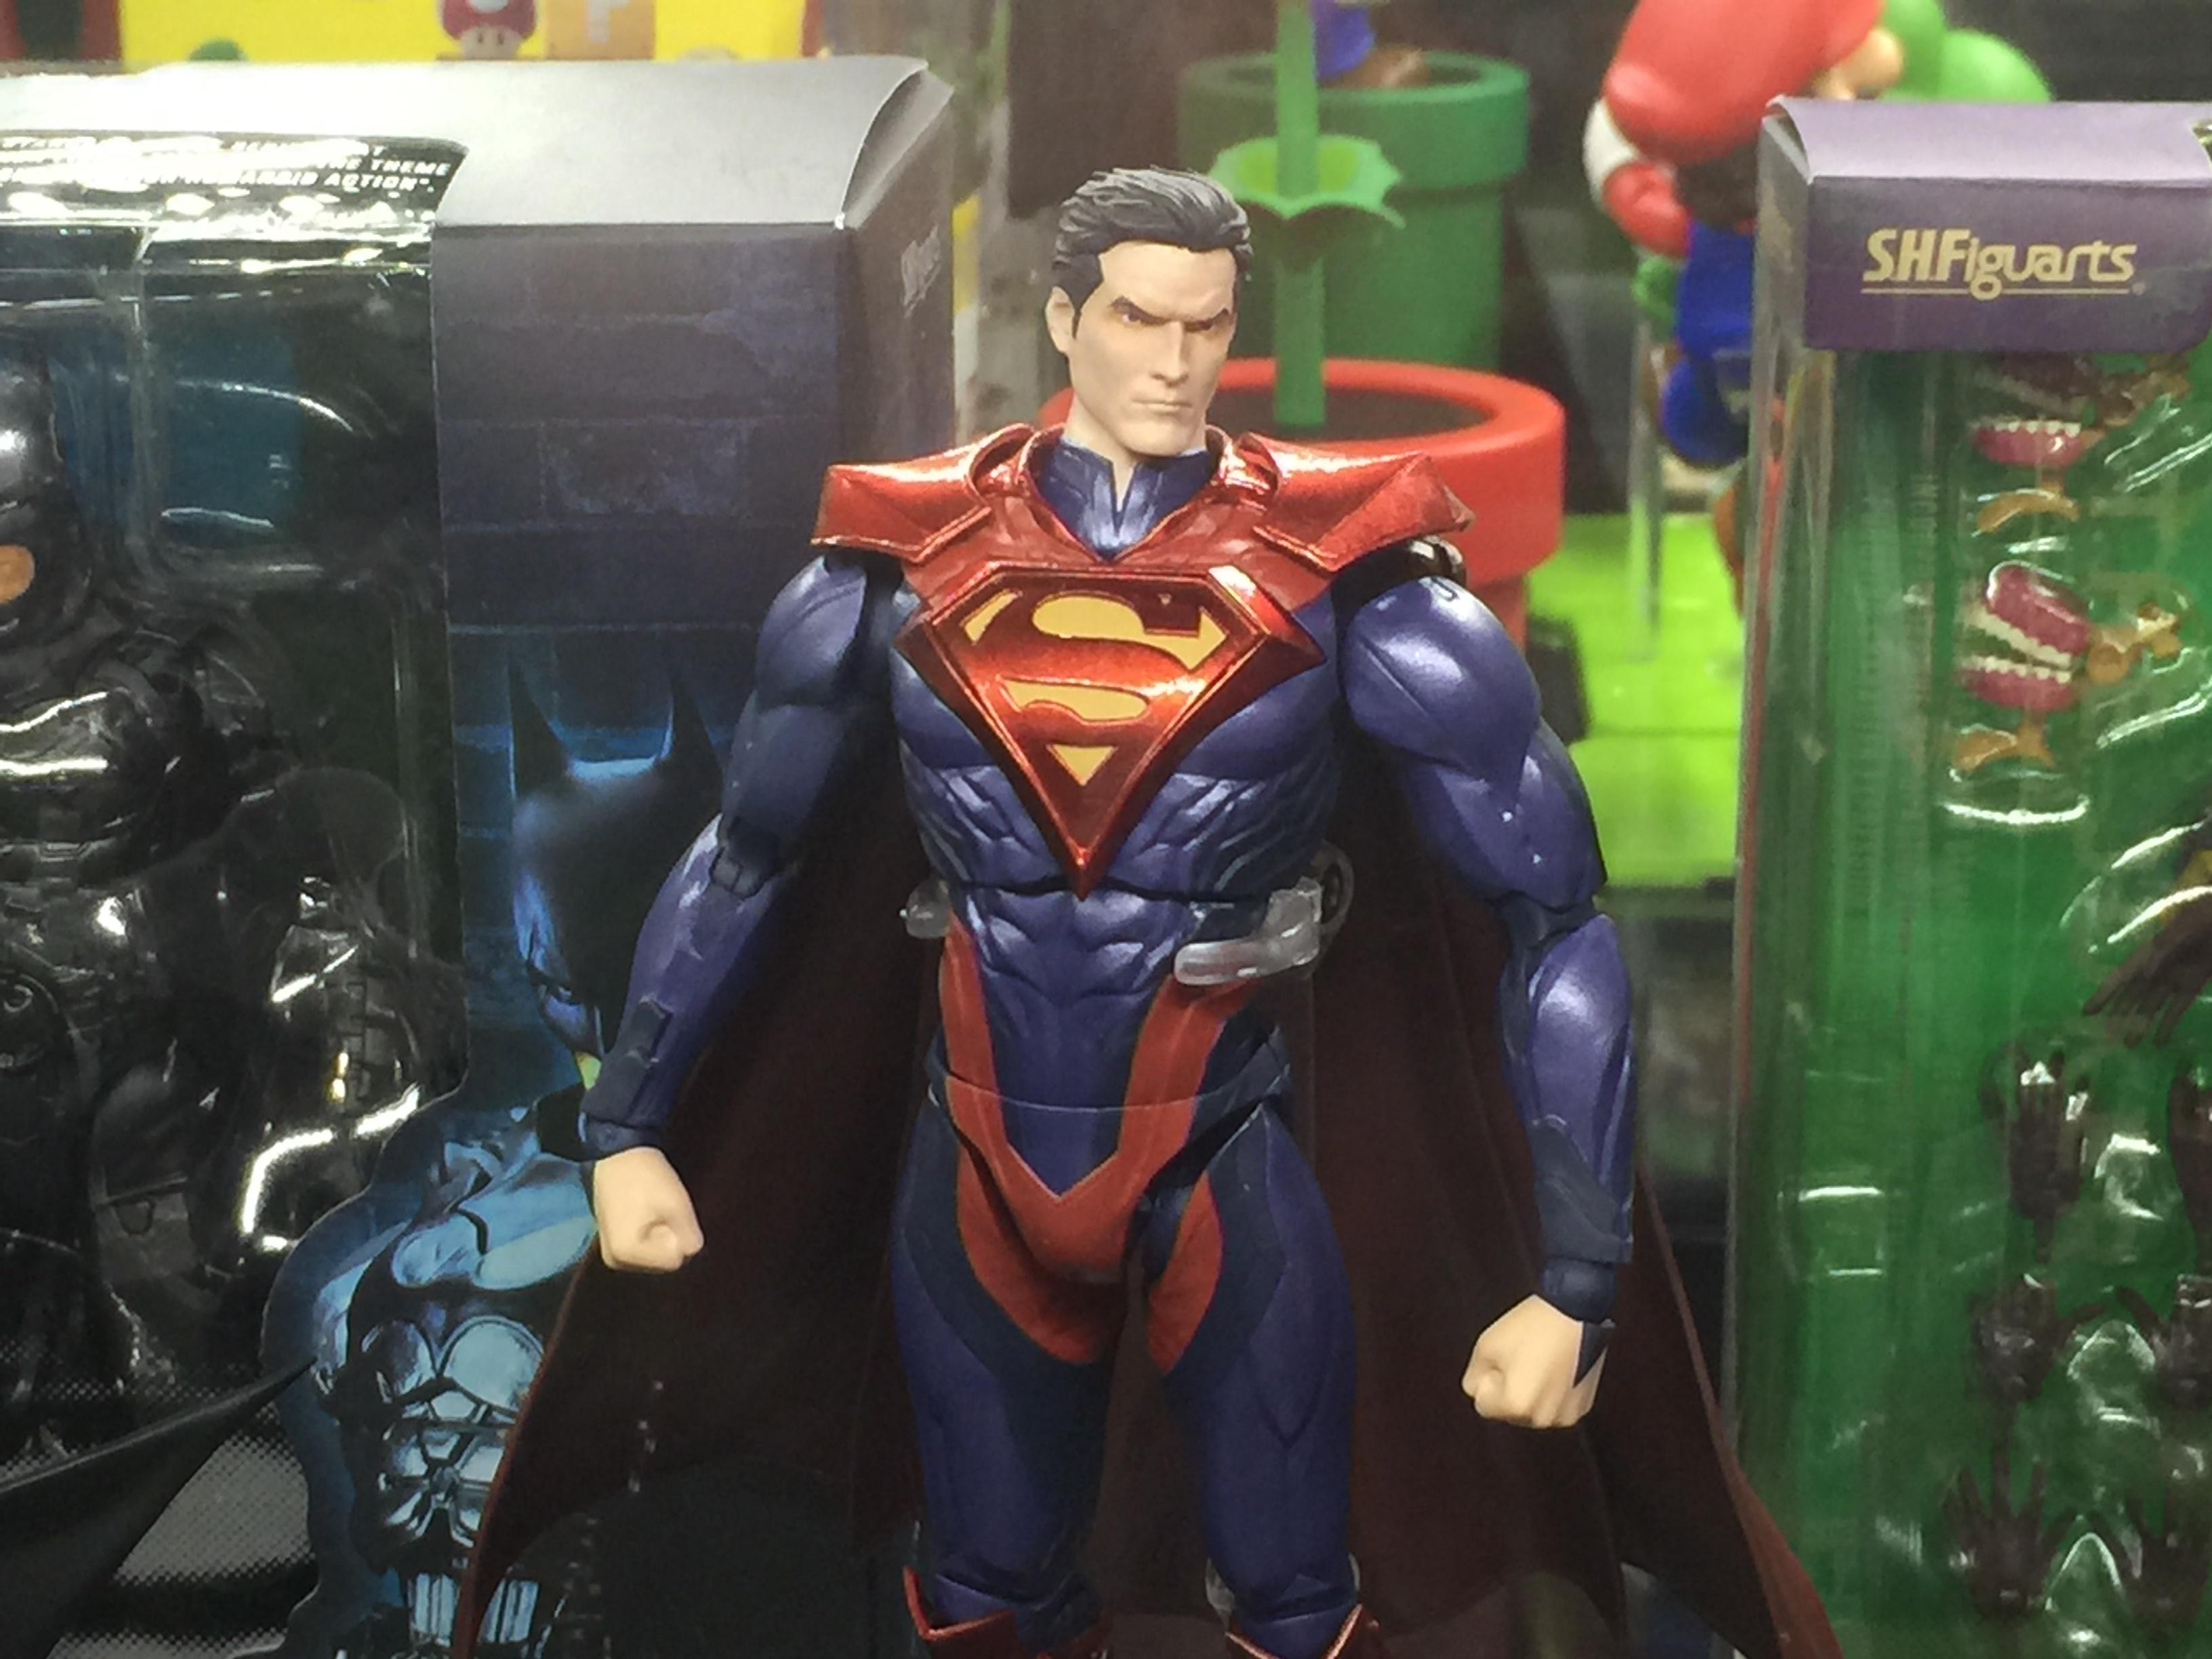 Super mario gets some - 1 part 10